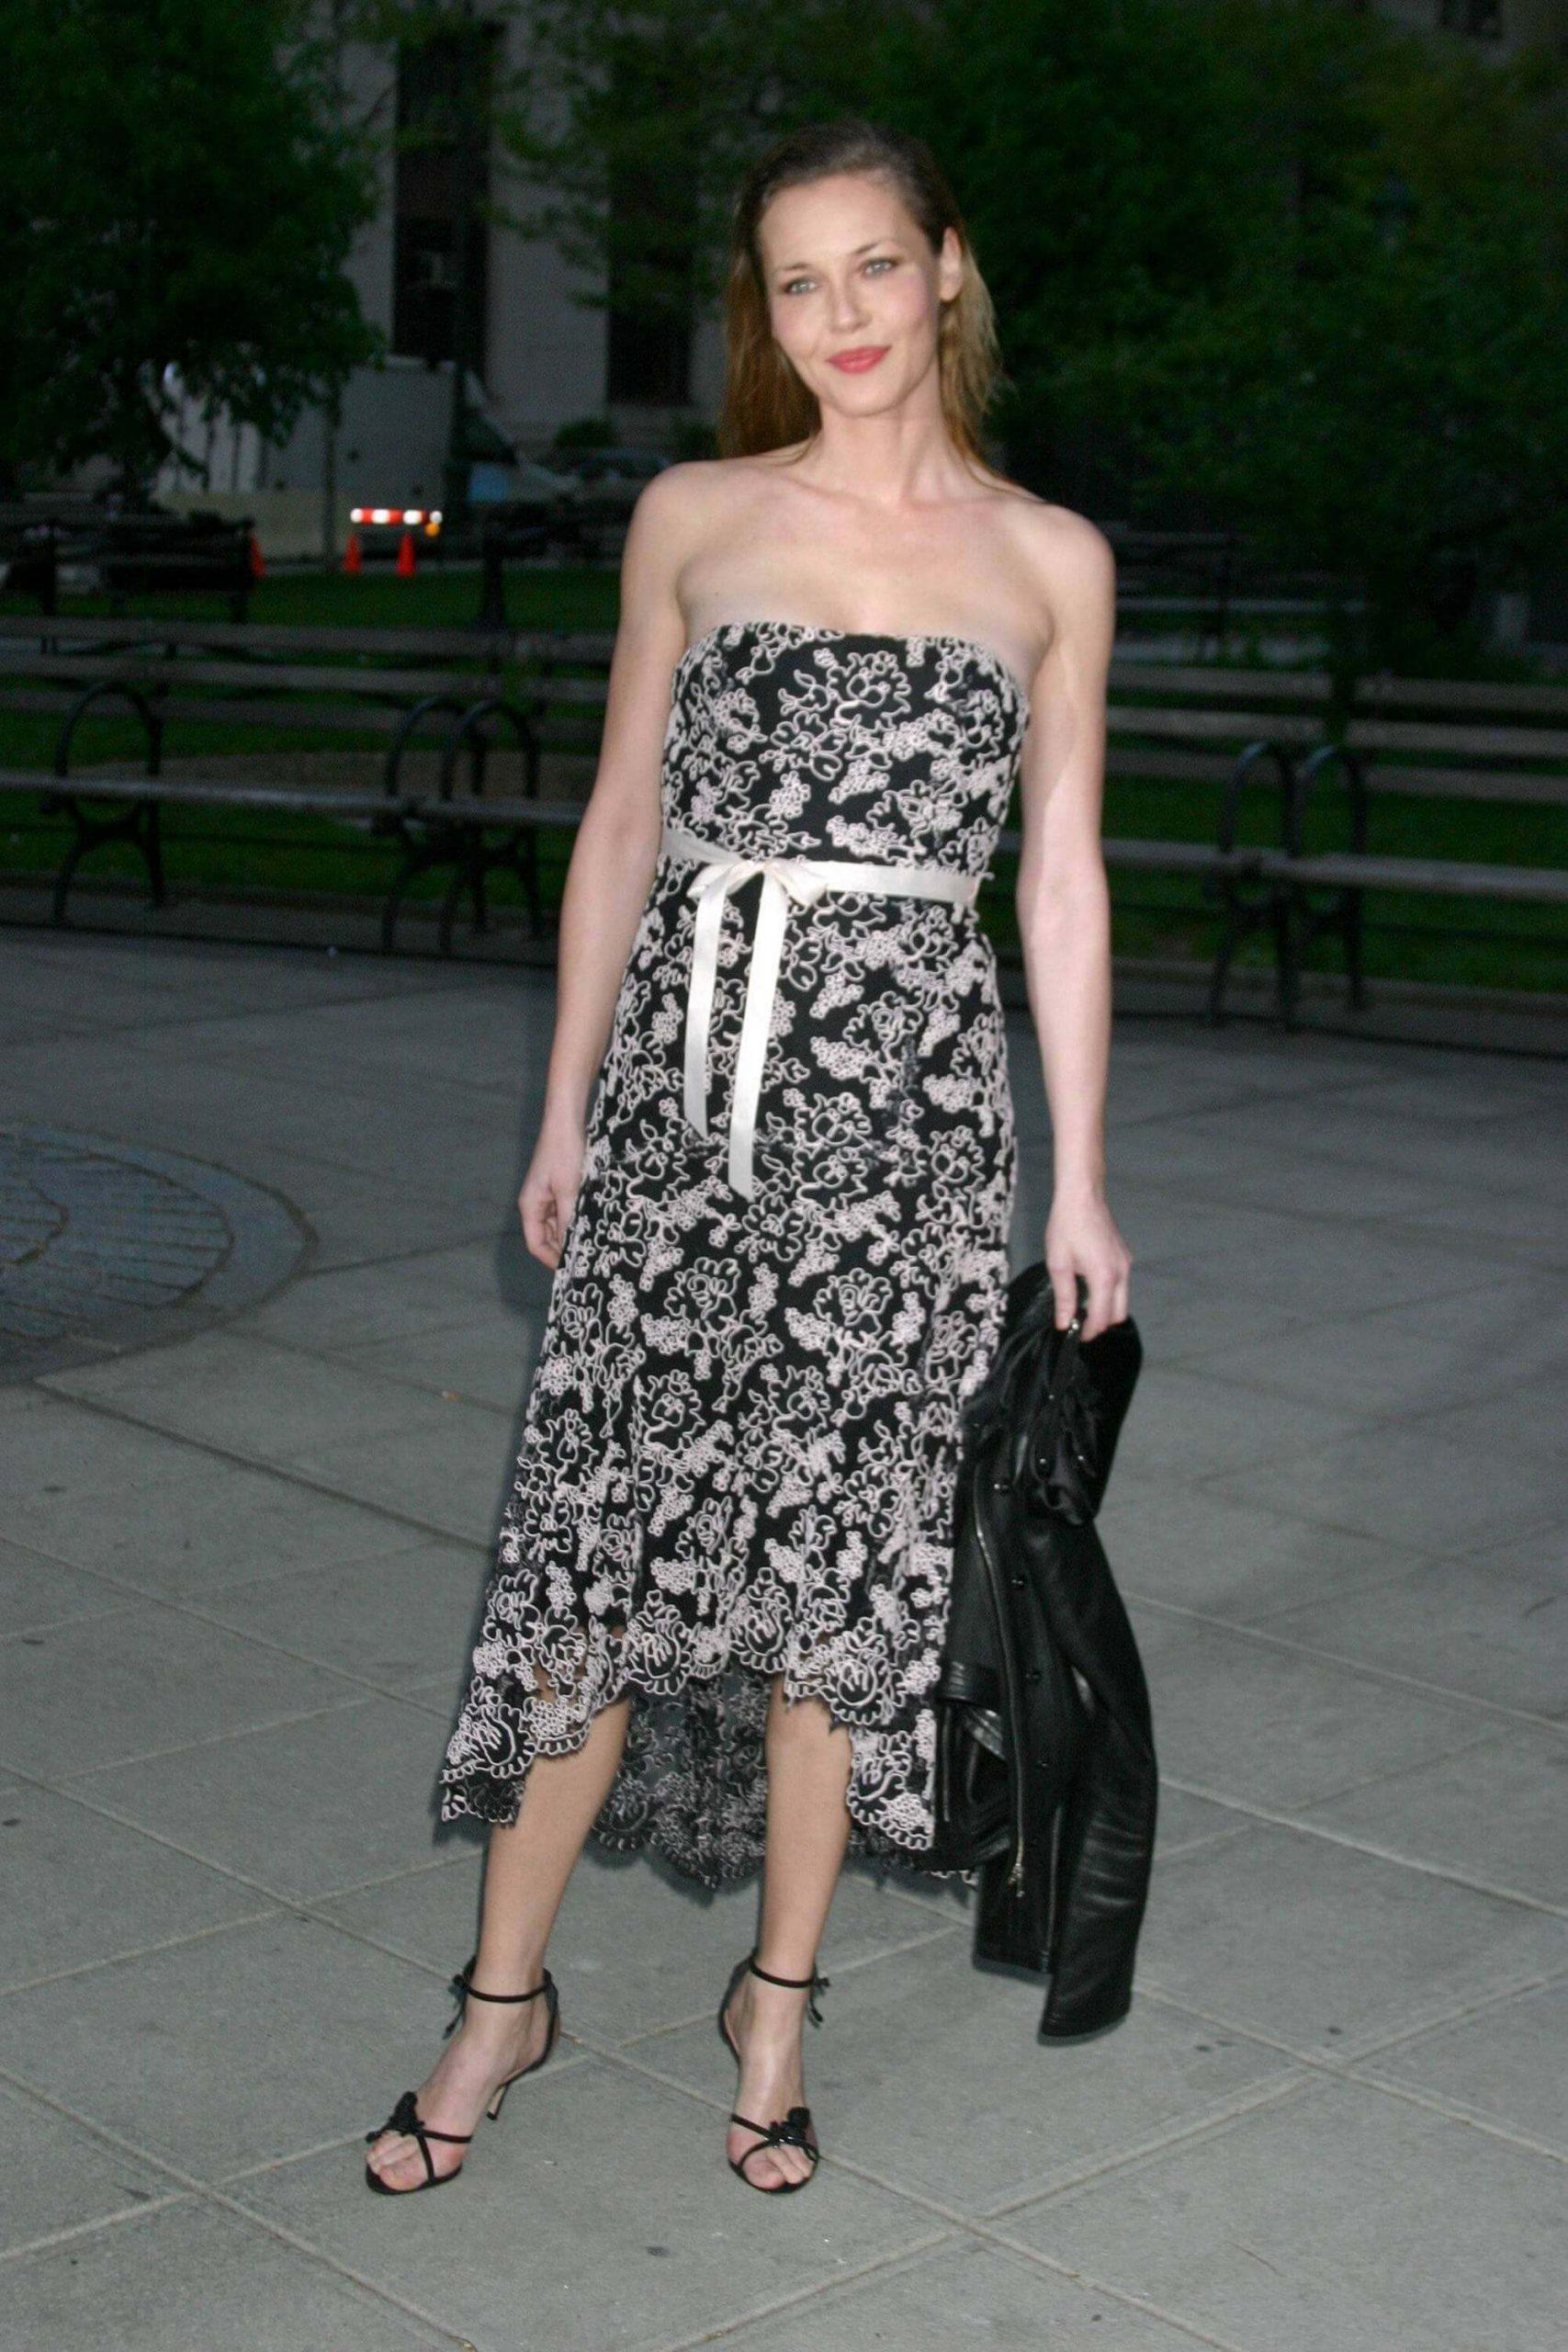 Connie Nielsen amazing pics